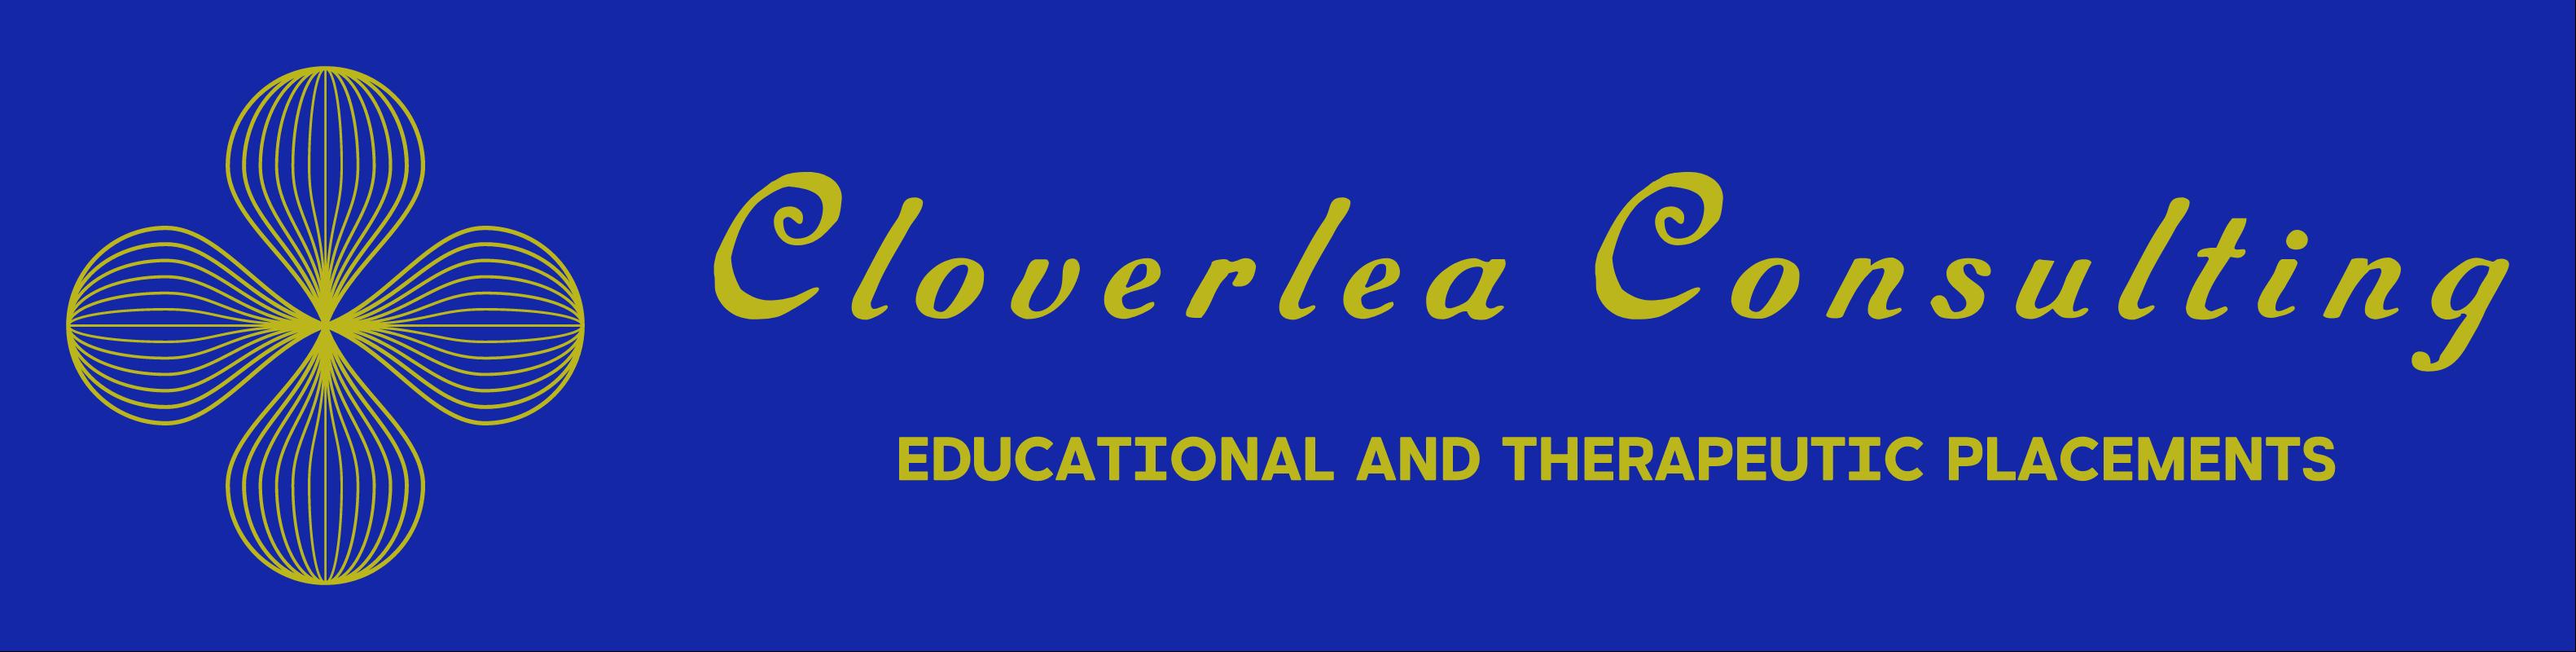 Cloverlea Consulting, LLC